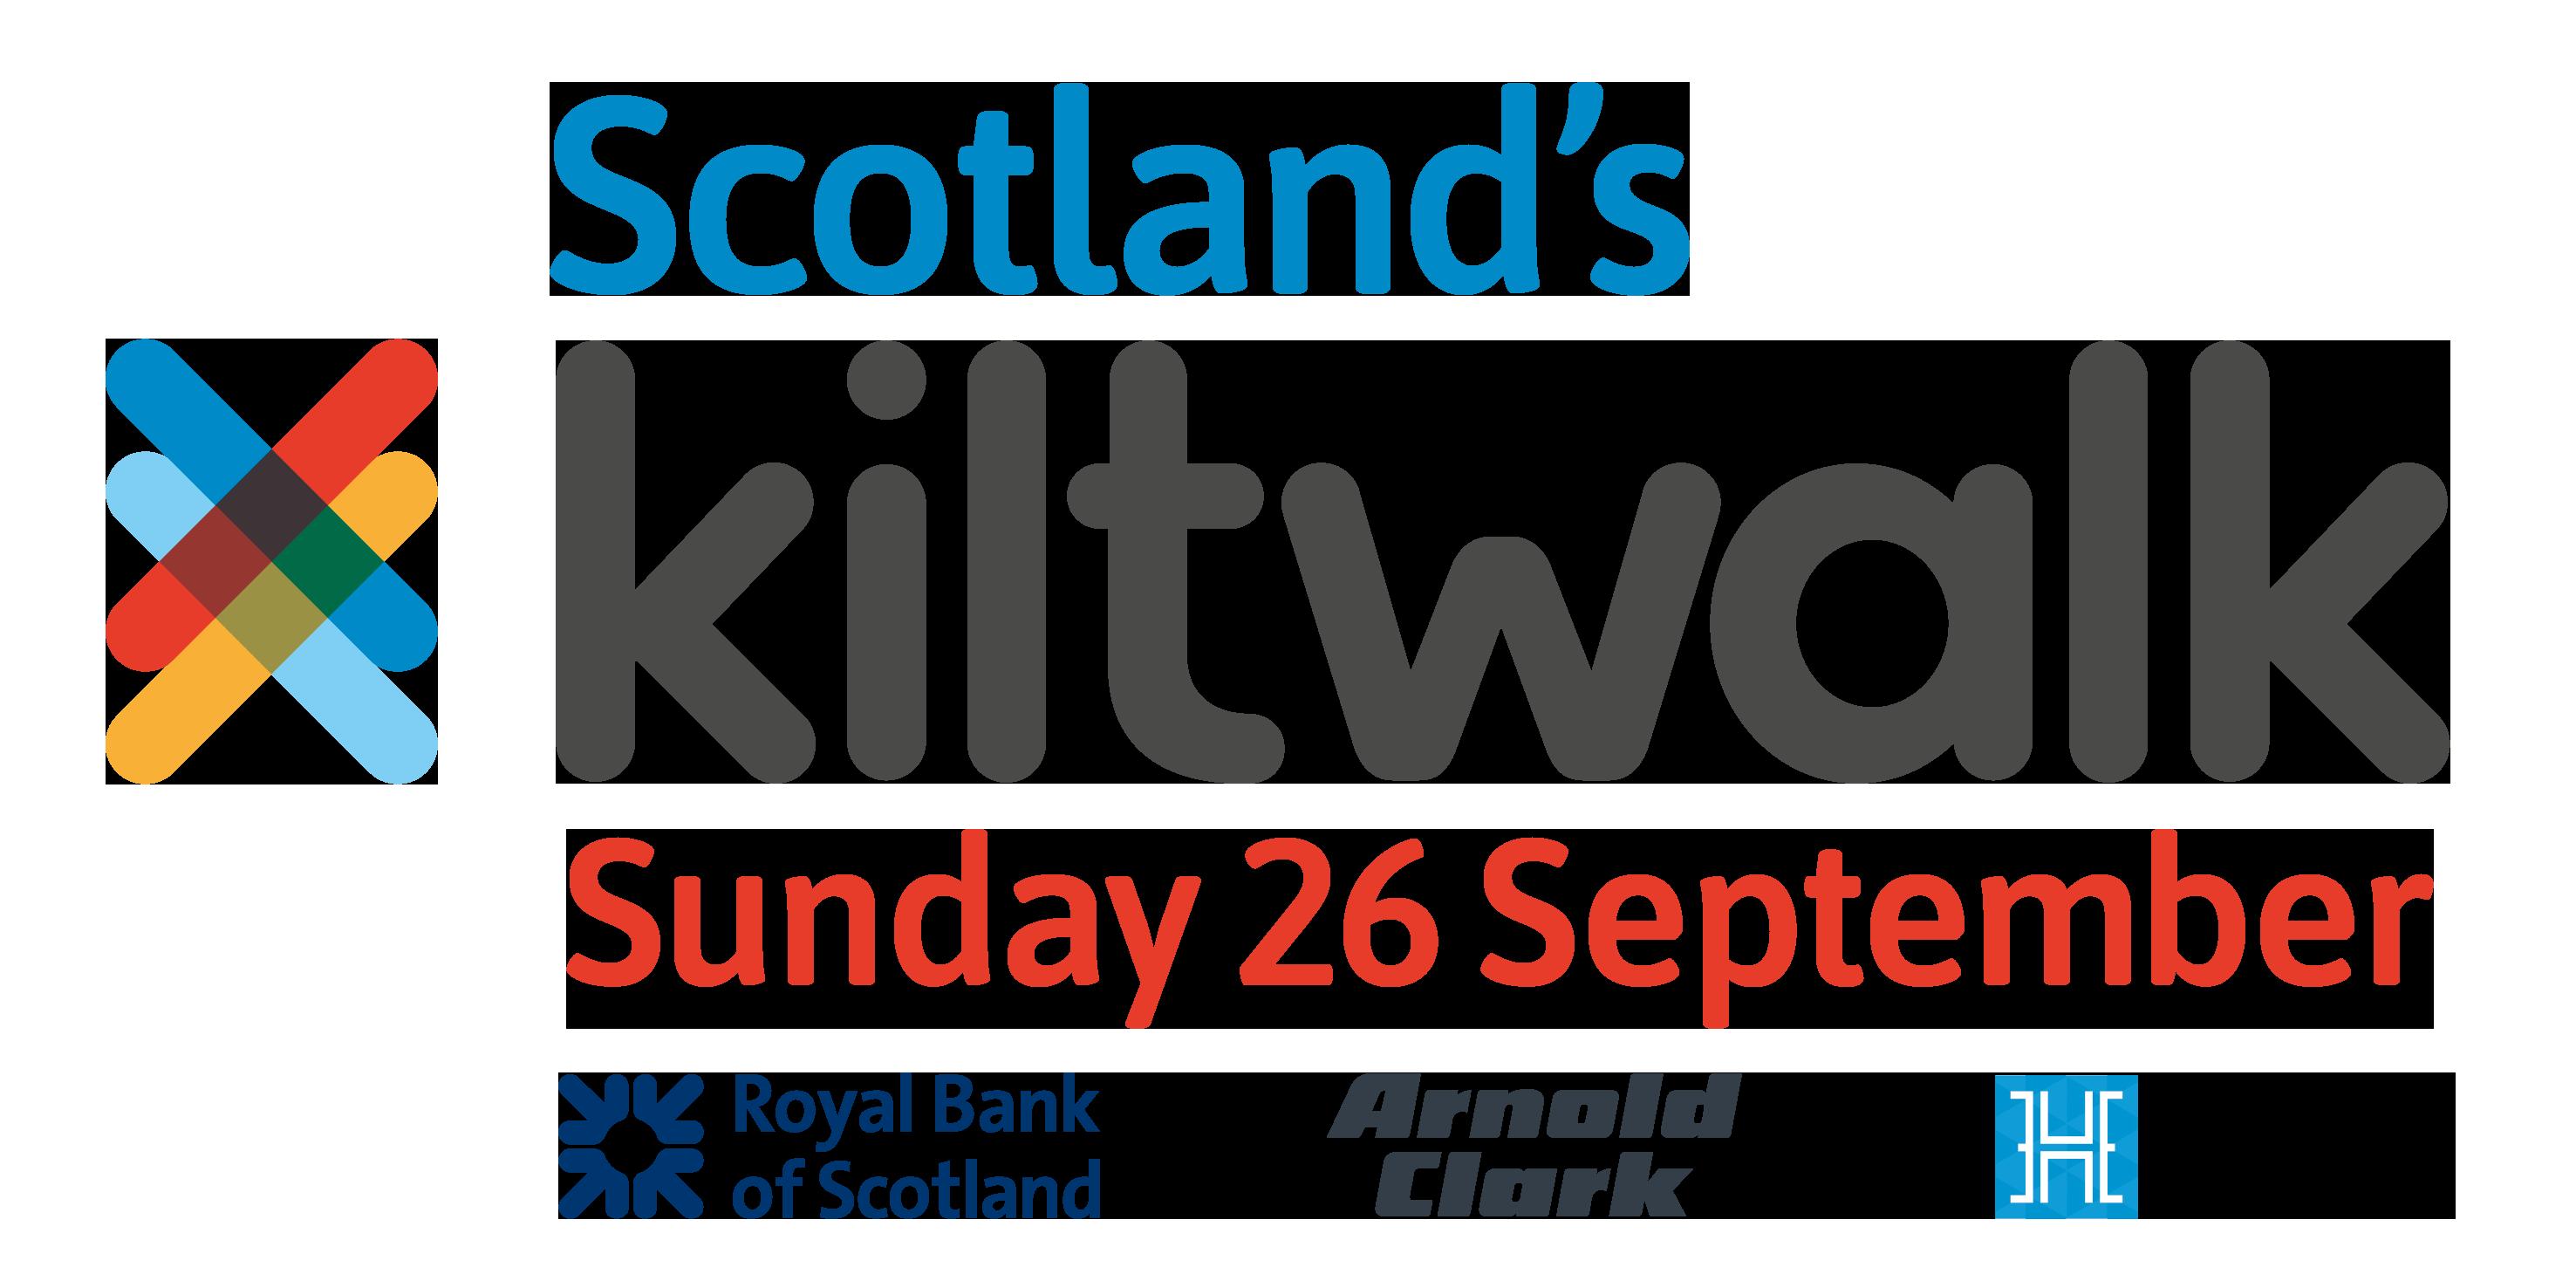 scotlands kiltwalk logo